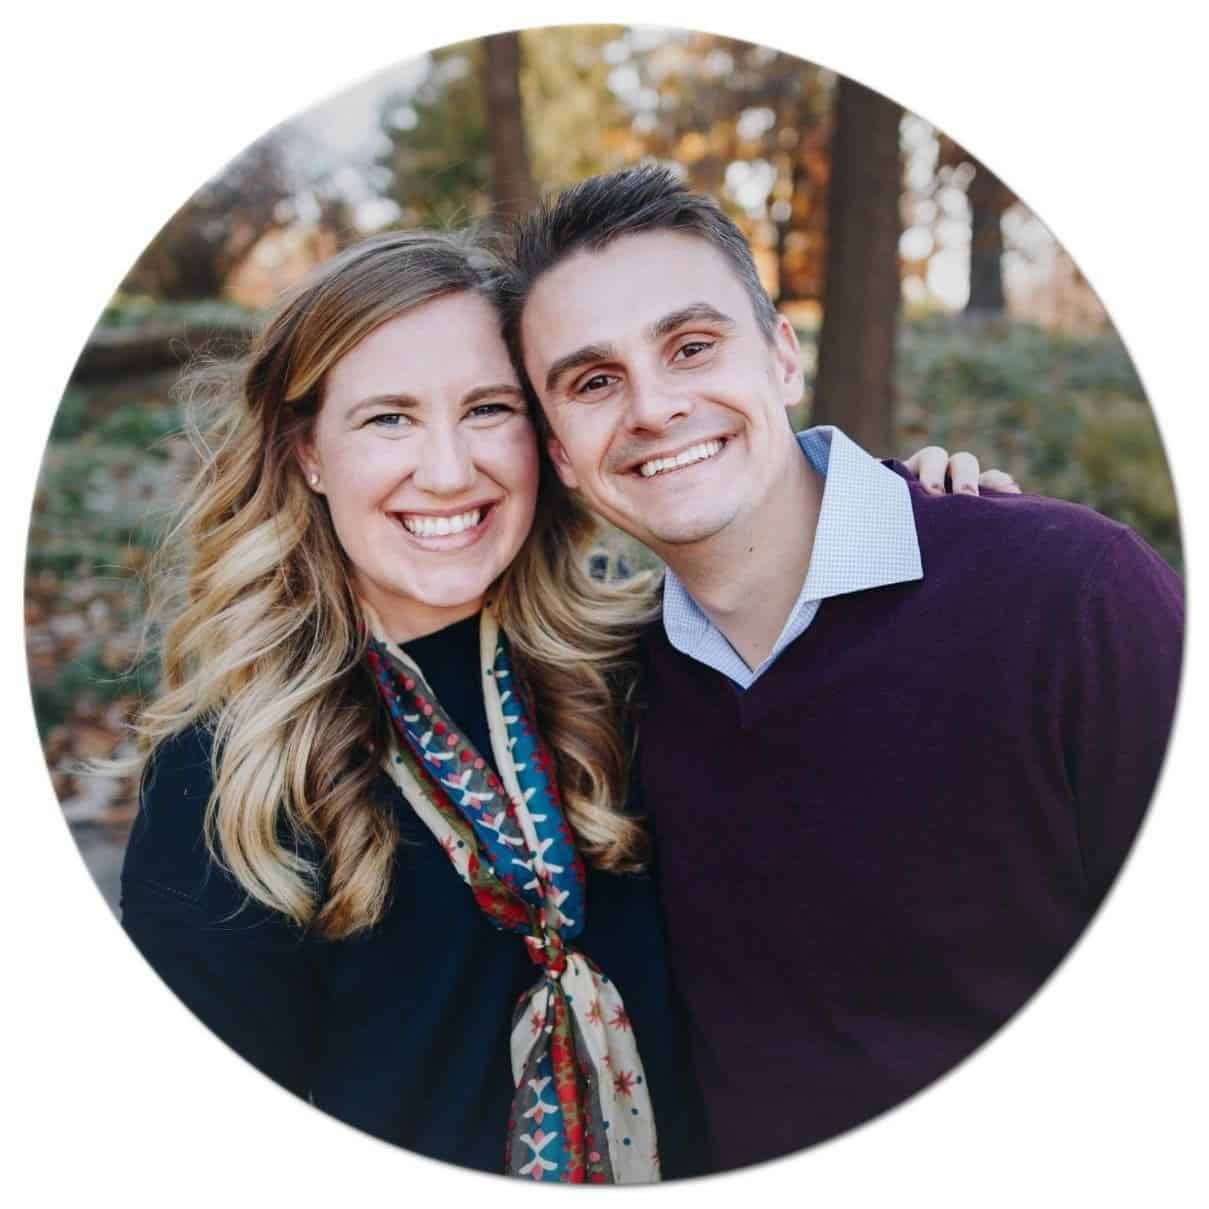 Christian premarital counseling